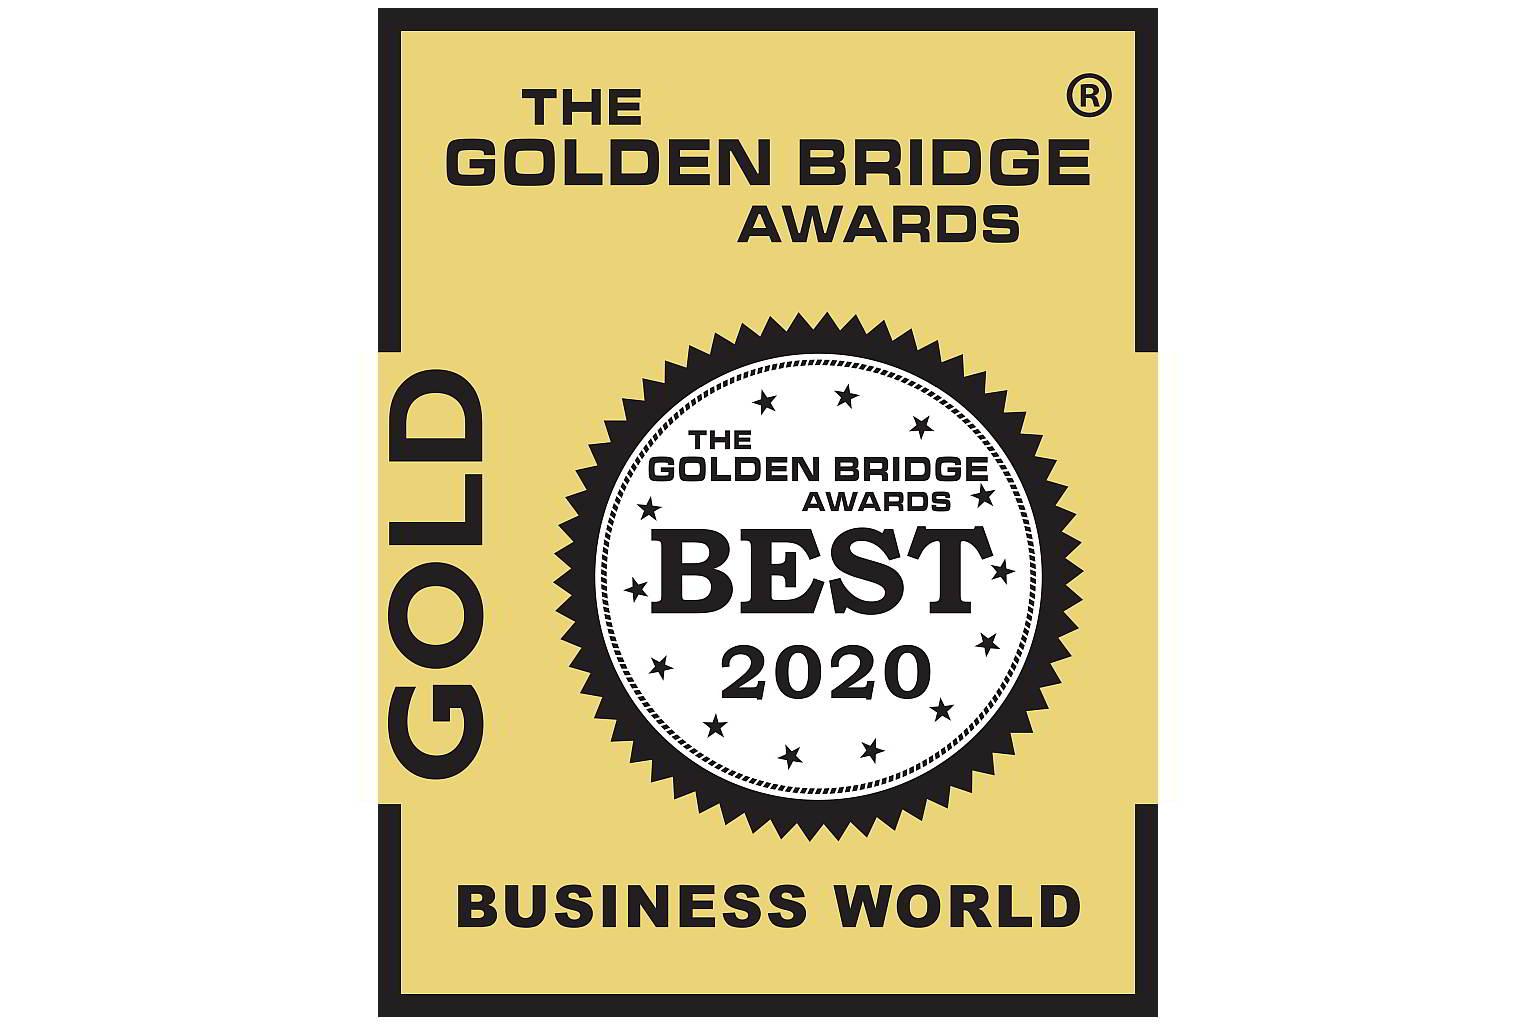 UCC Filing Hub wins gold from Golden Bridge Awards